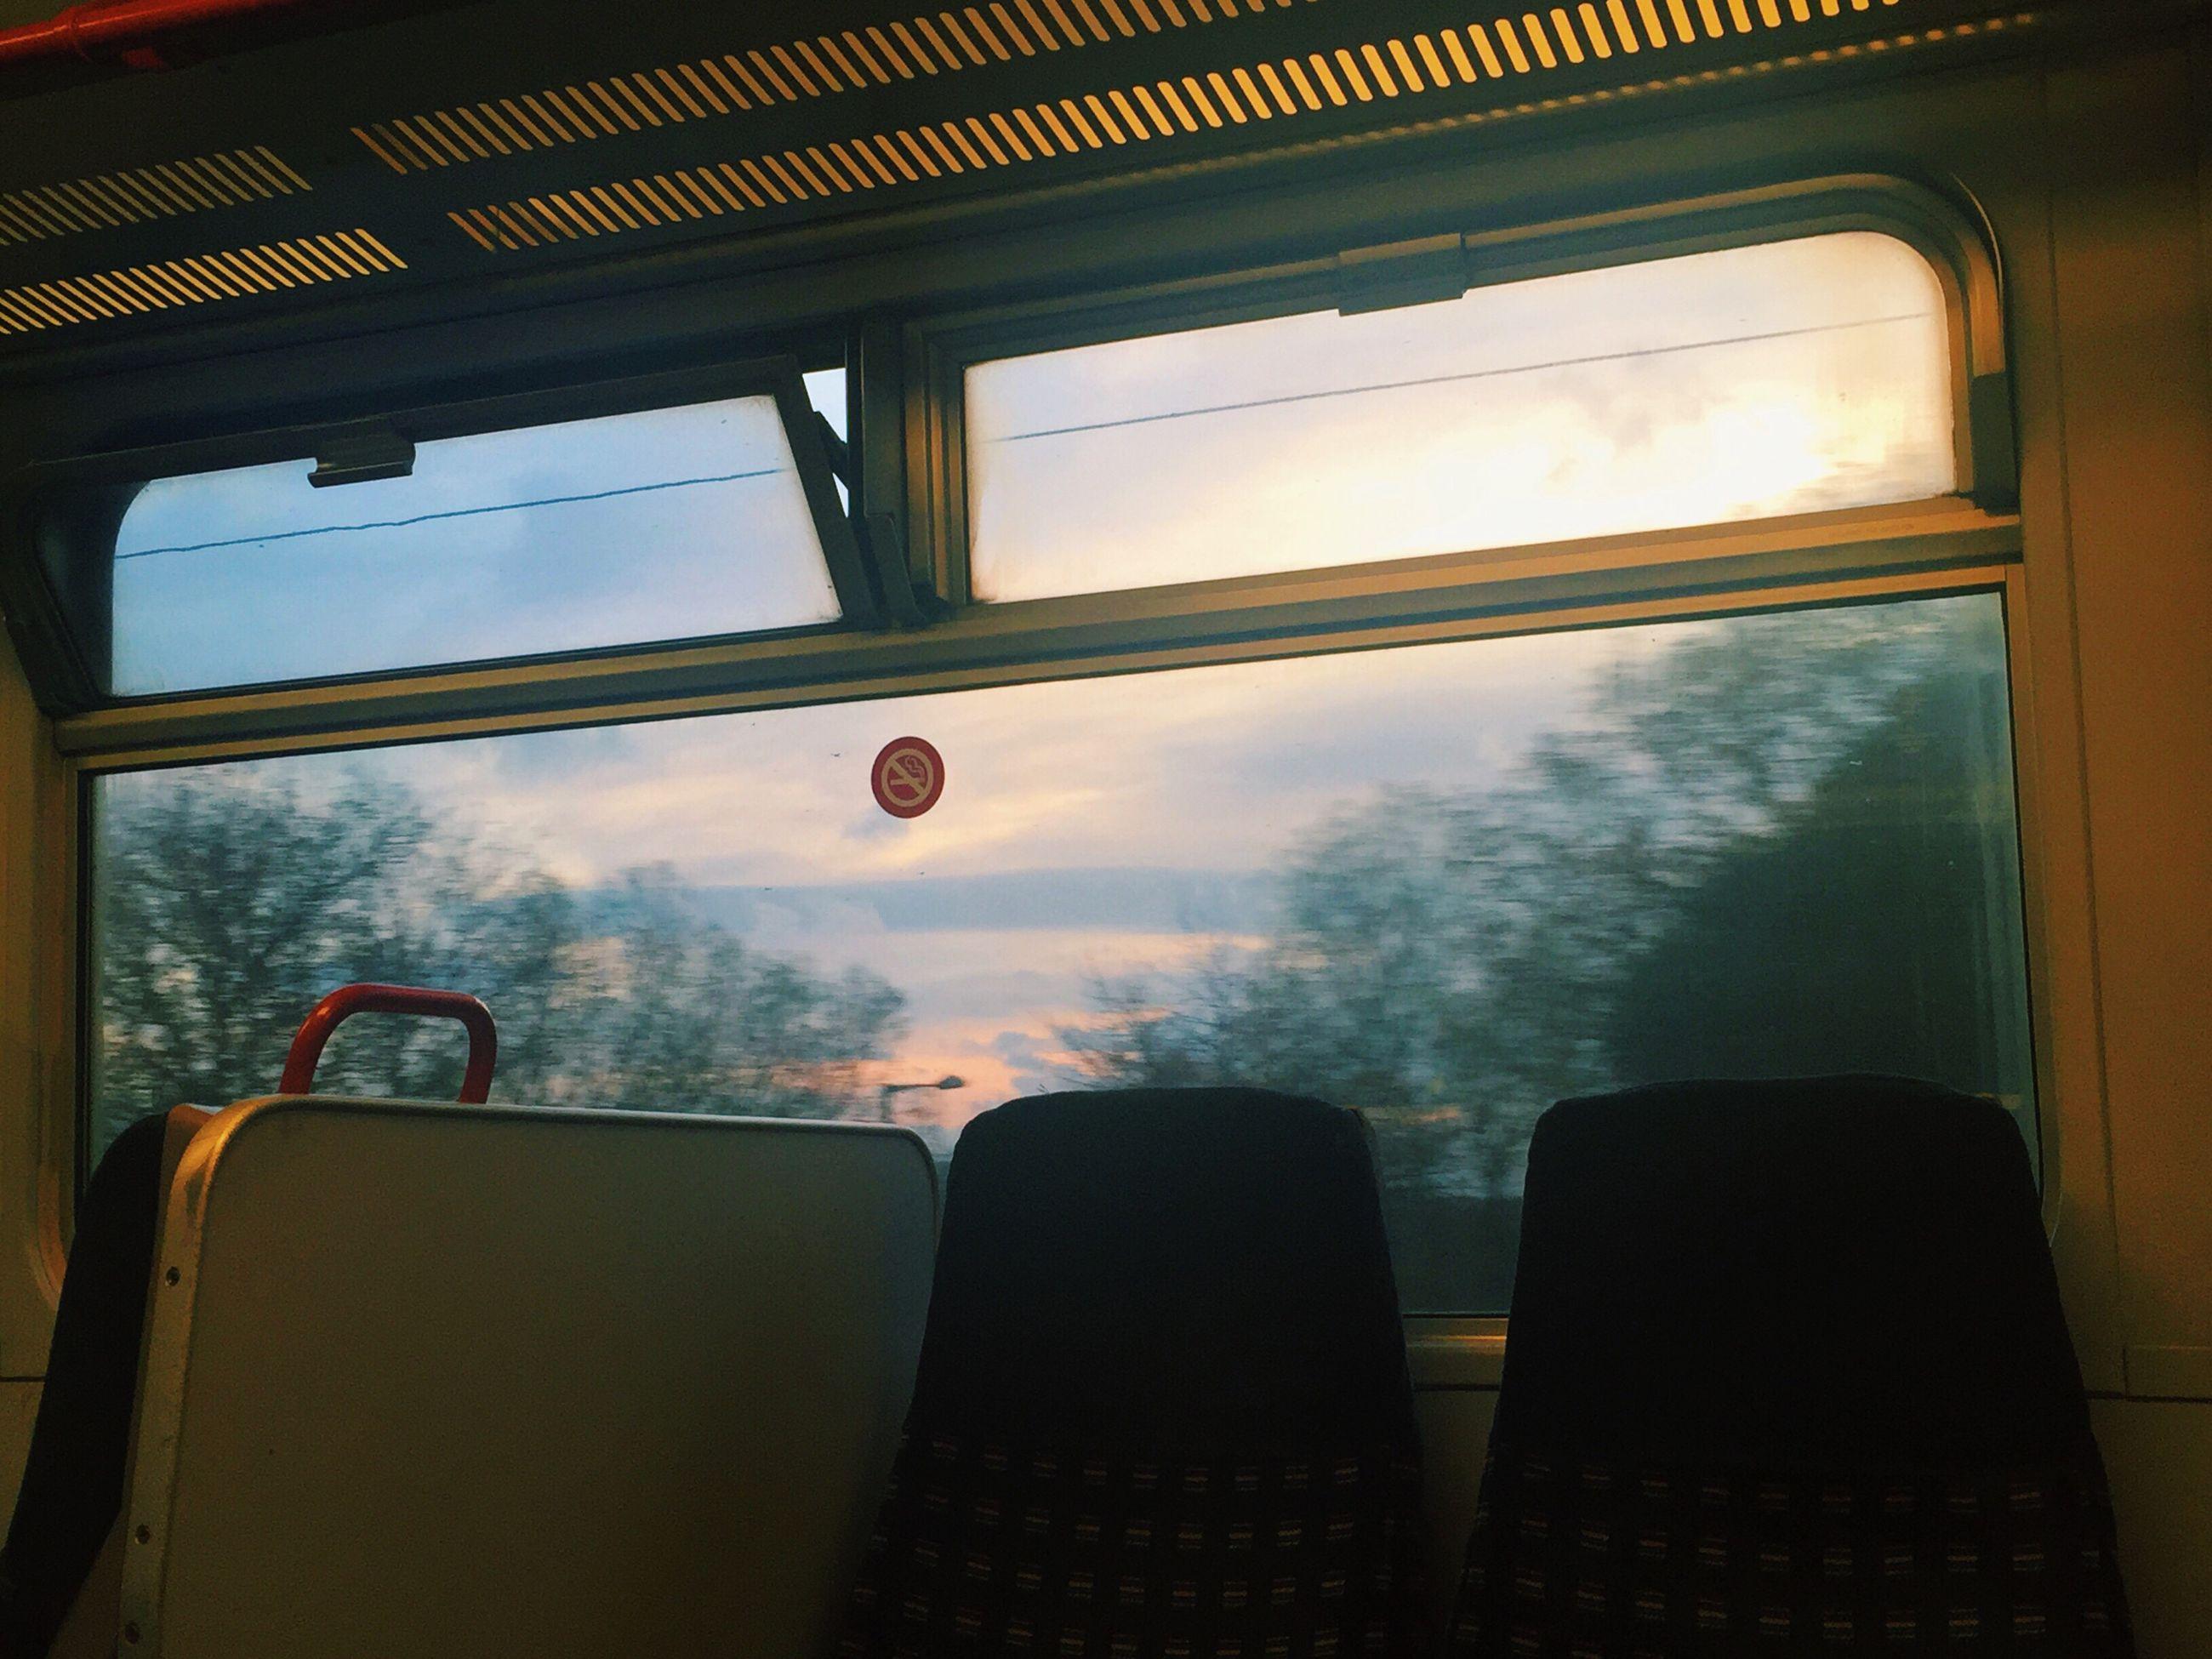 VIEW OF TRAIN SEEN THROUGH WINDOW